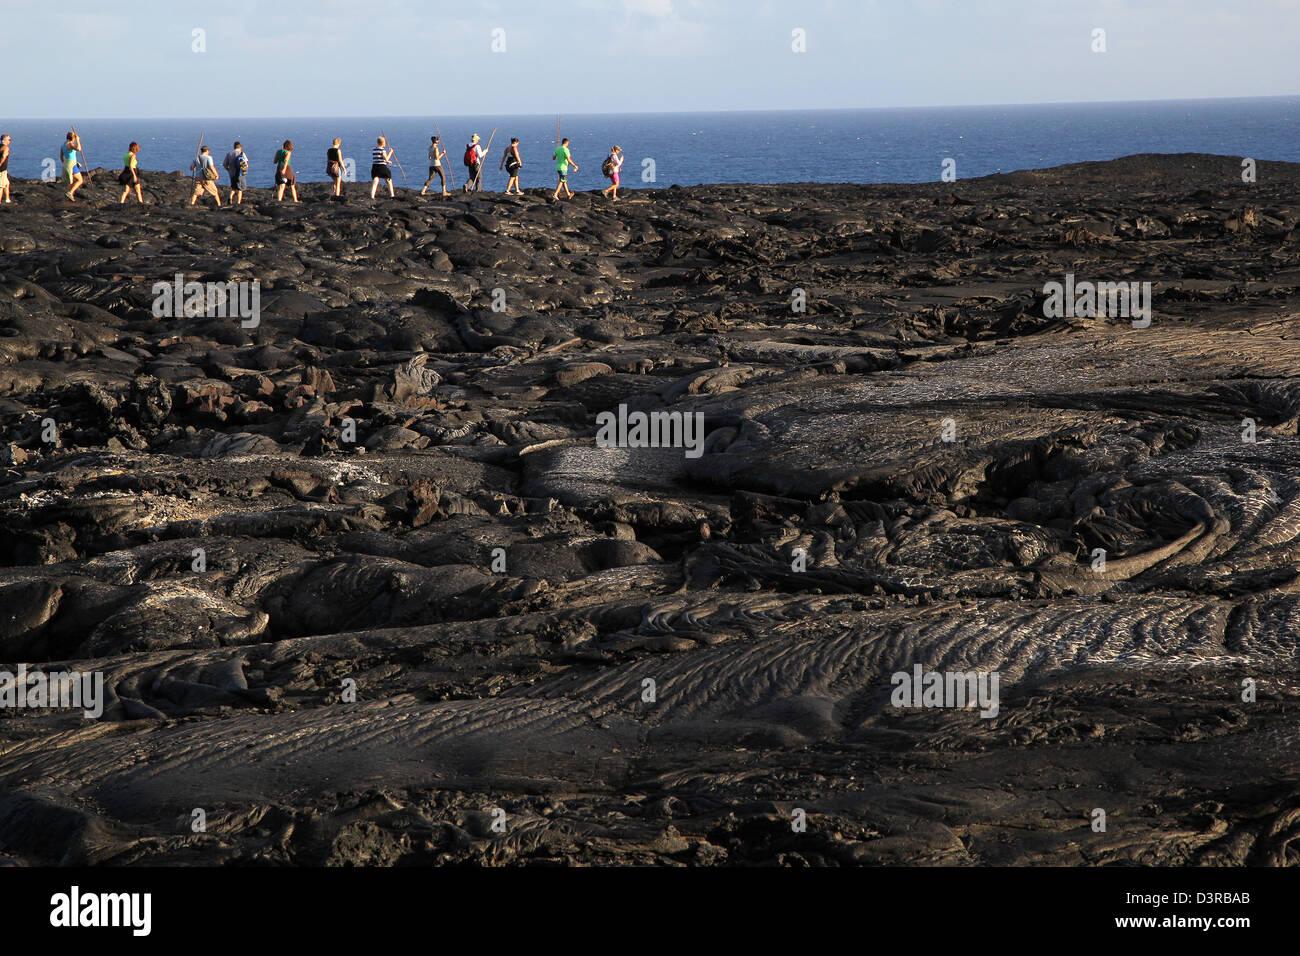 hikers on recent Pahoehoe lava from Kilauea Volcano Hawaii - Stock Image